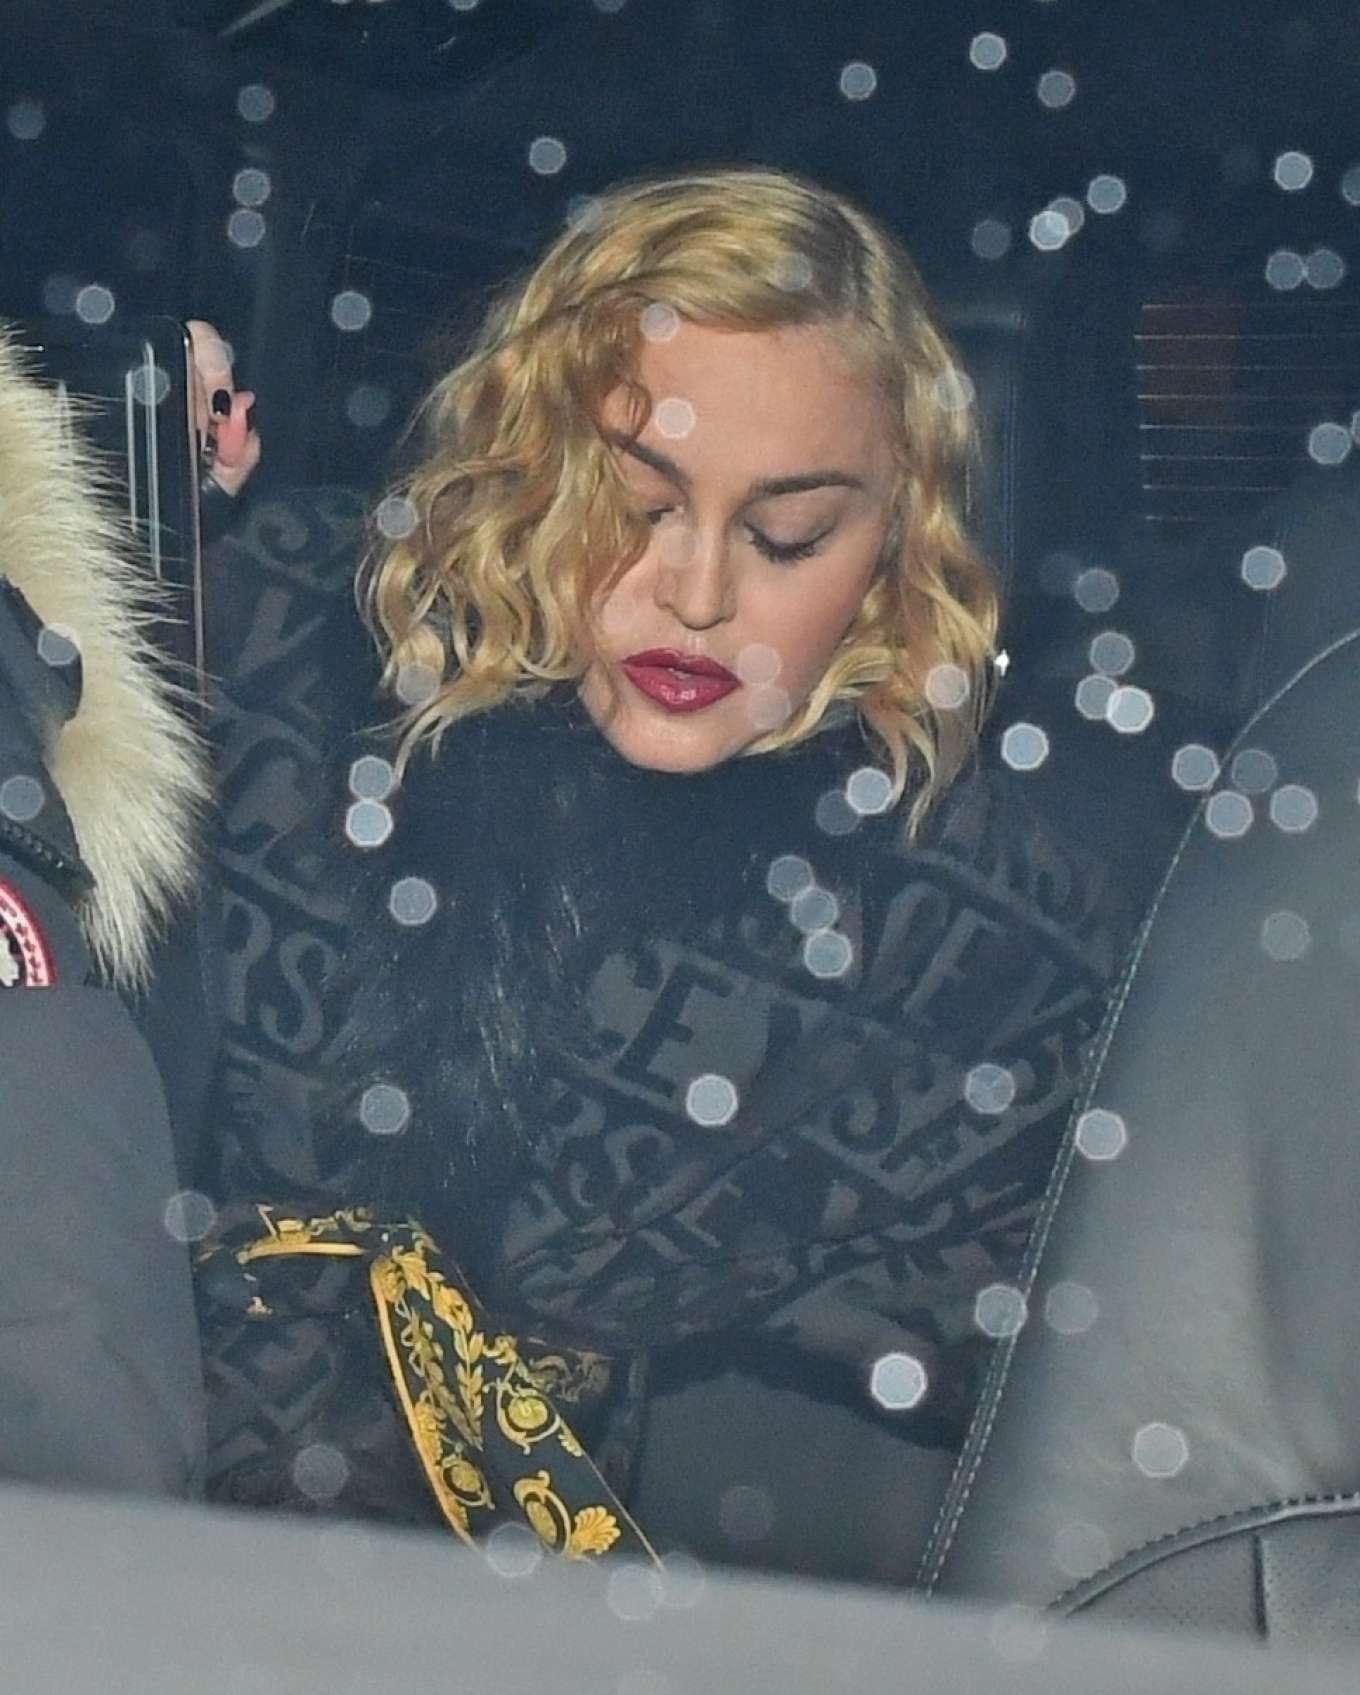 Madonna - Looking glum as she leaves London Paladium